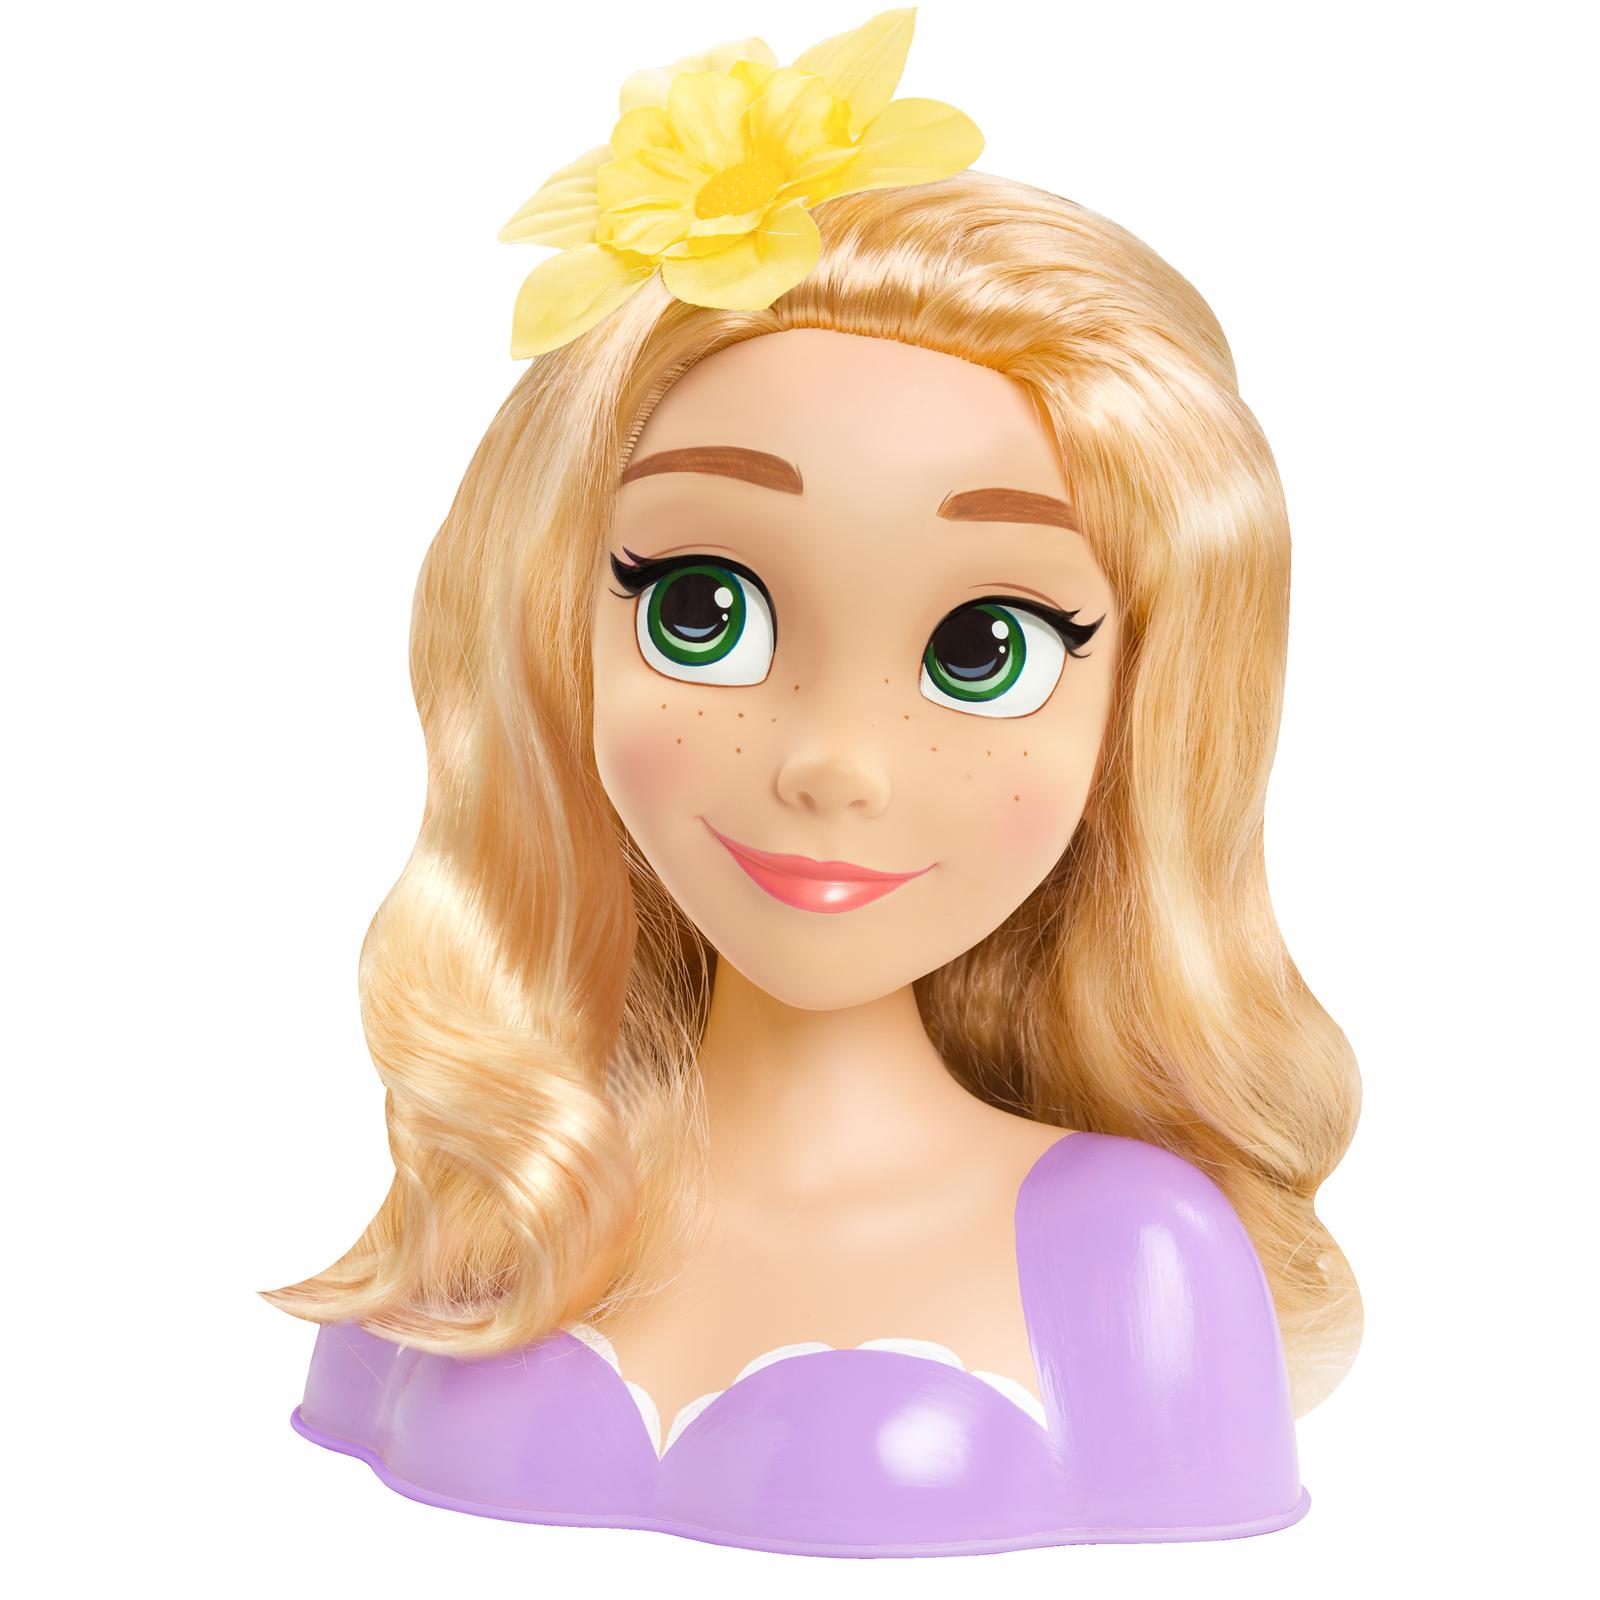 Disney: Princess Styling Head - Rapunzel image